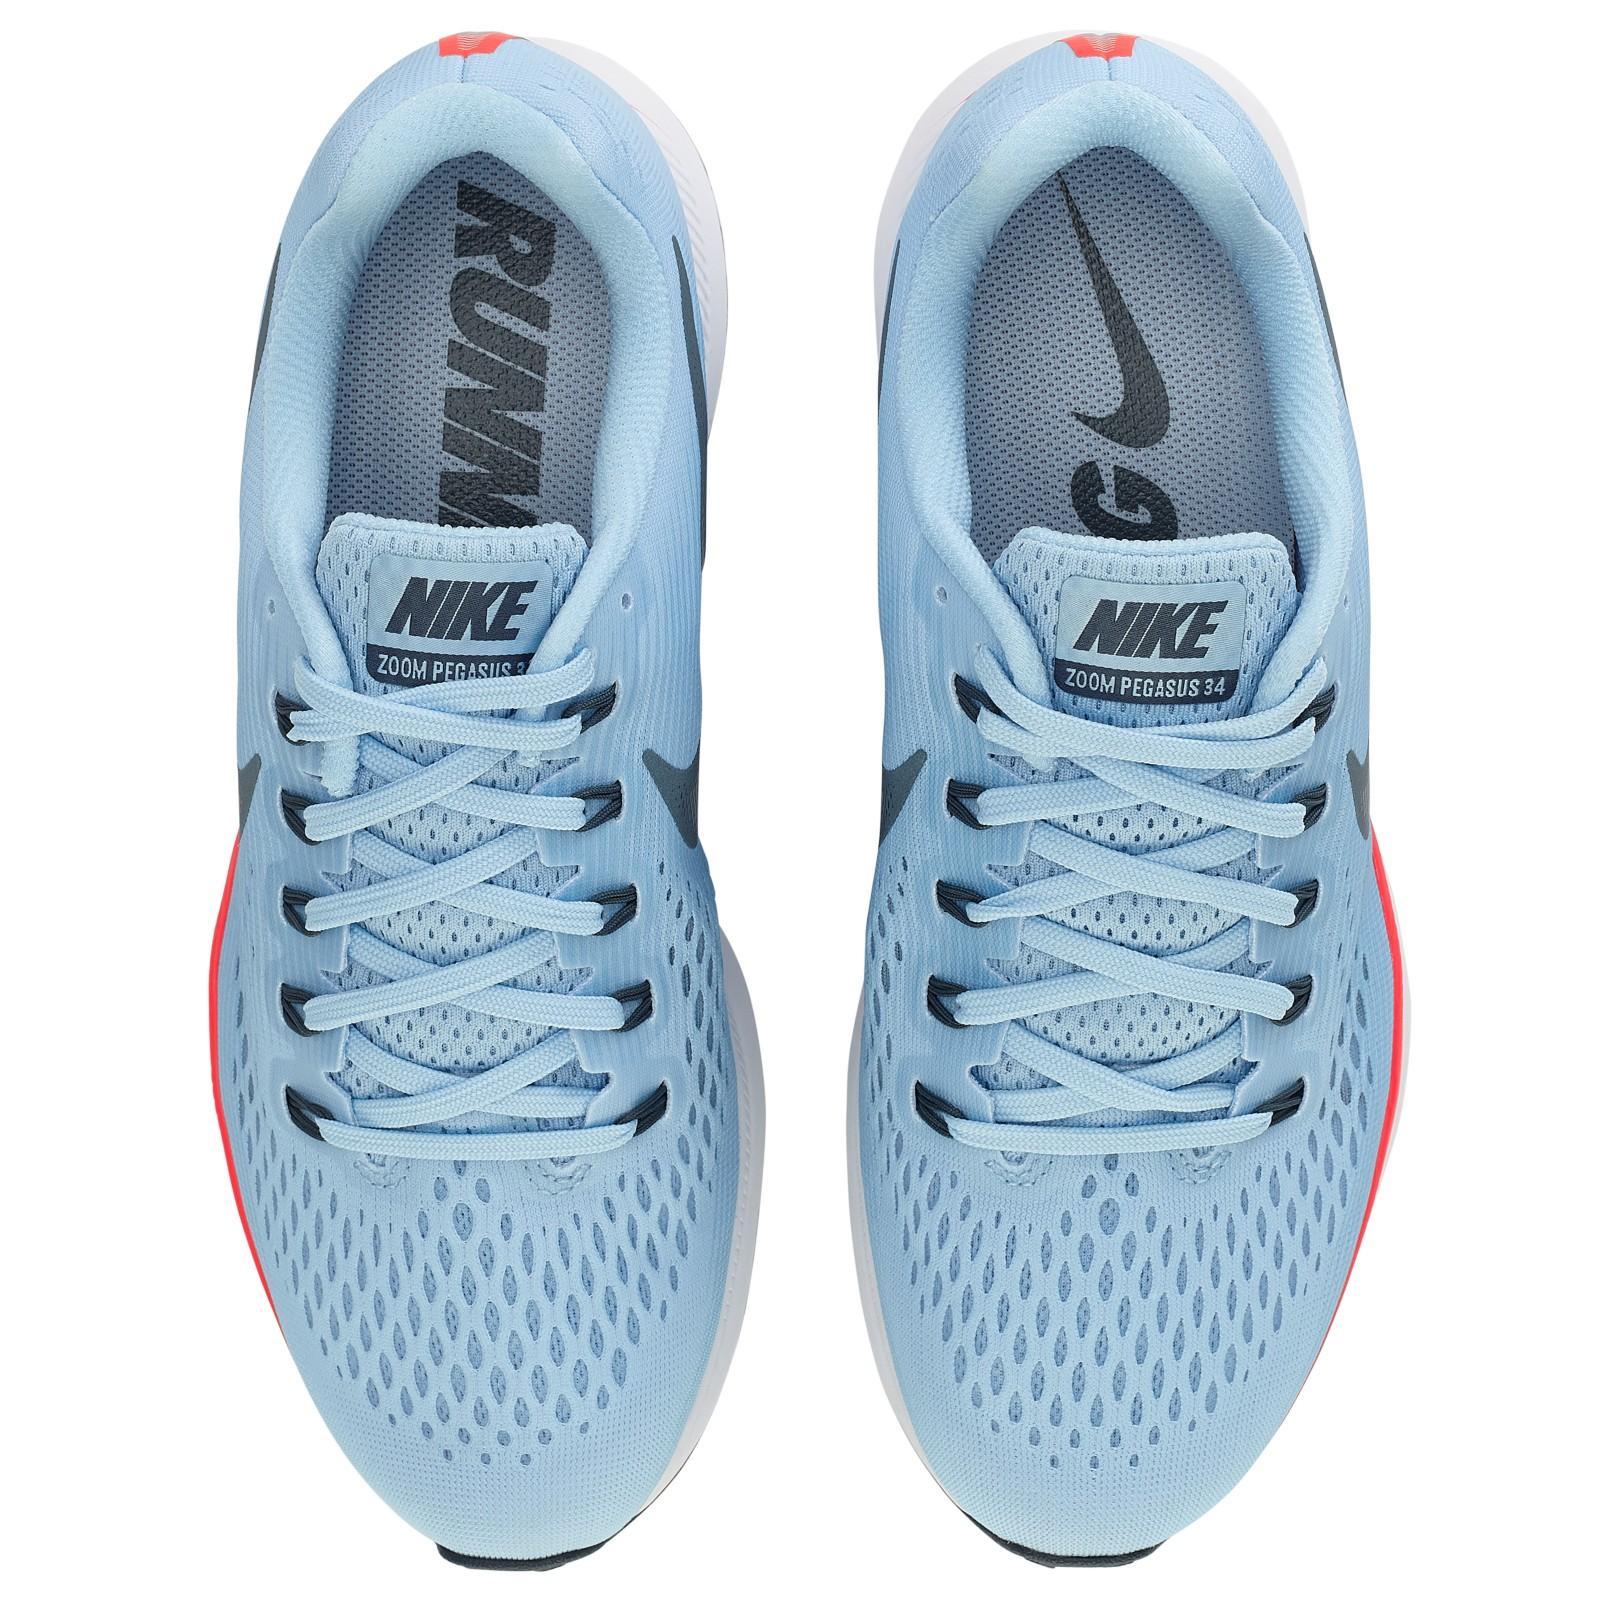 Nike Rubber Air Zoom Pegasus 34 Men's Running Shoes in Blue for Men